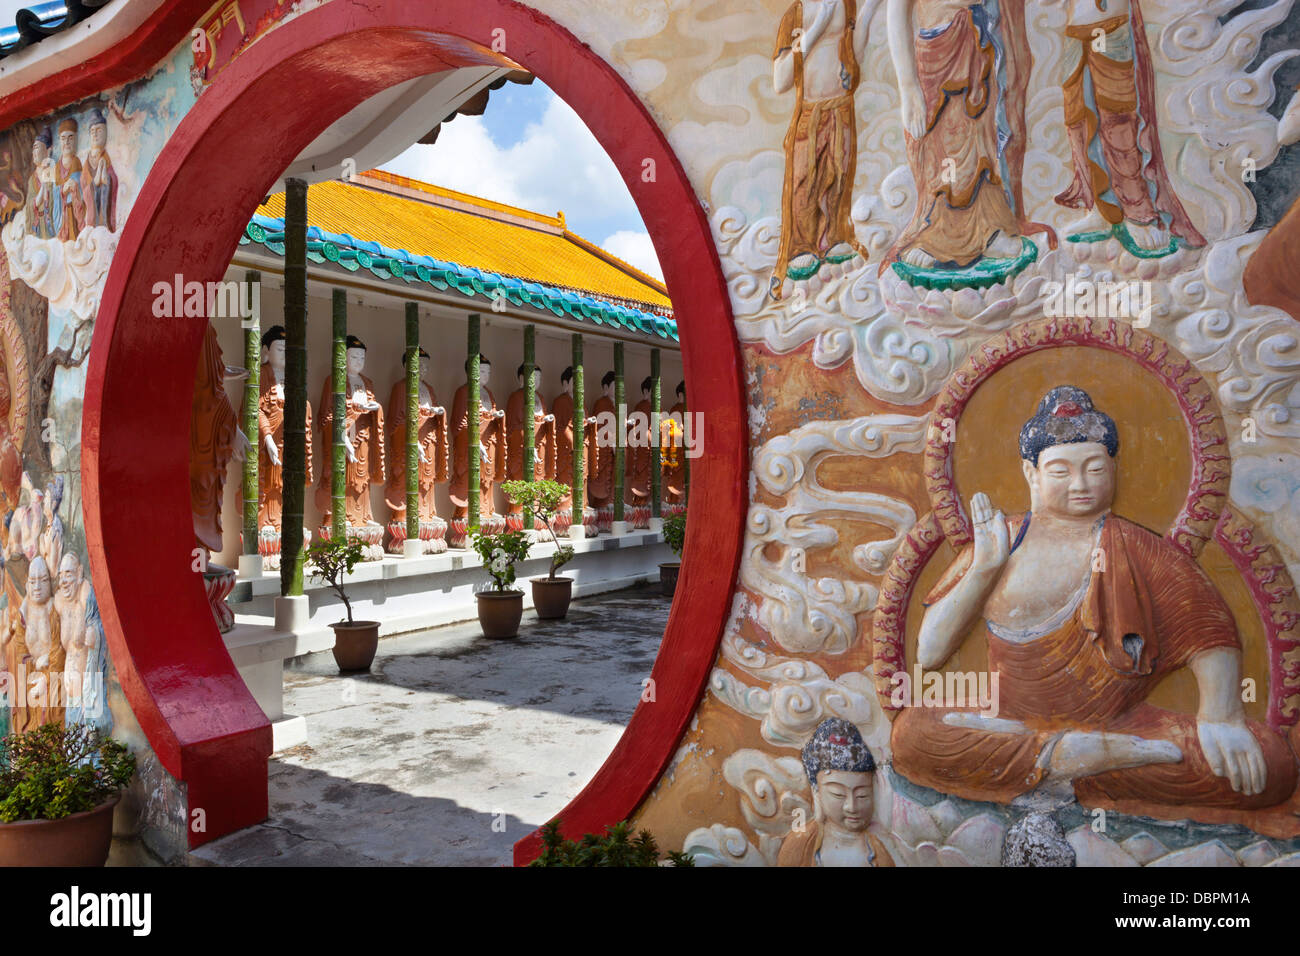 Porta circolare e di Buddha, Tempio di Kek Lok Si, gru Hill, Georgetown, Pulau Penang, Malaysia, Asia sud-orientale, Immagini Stock